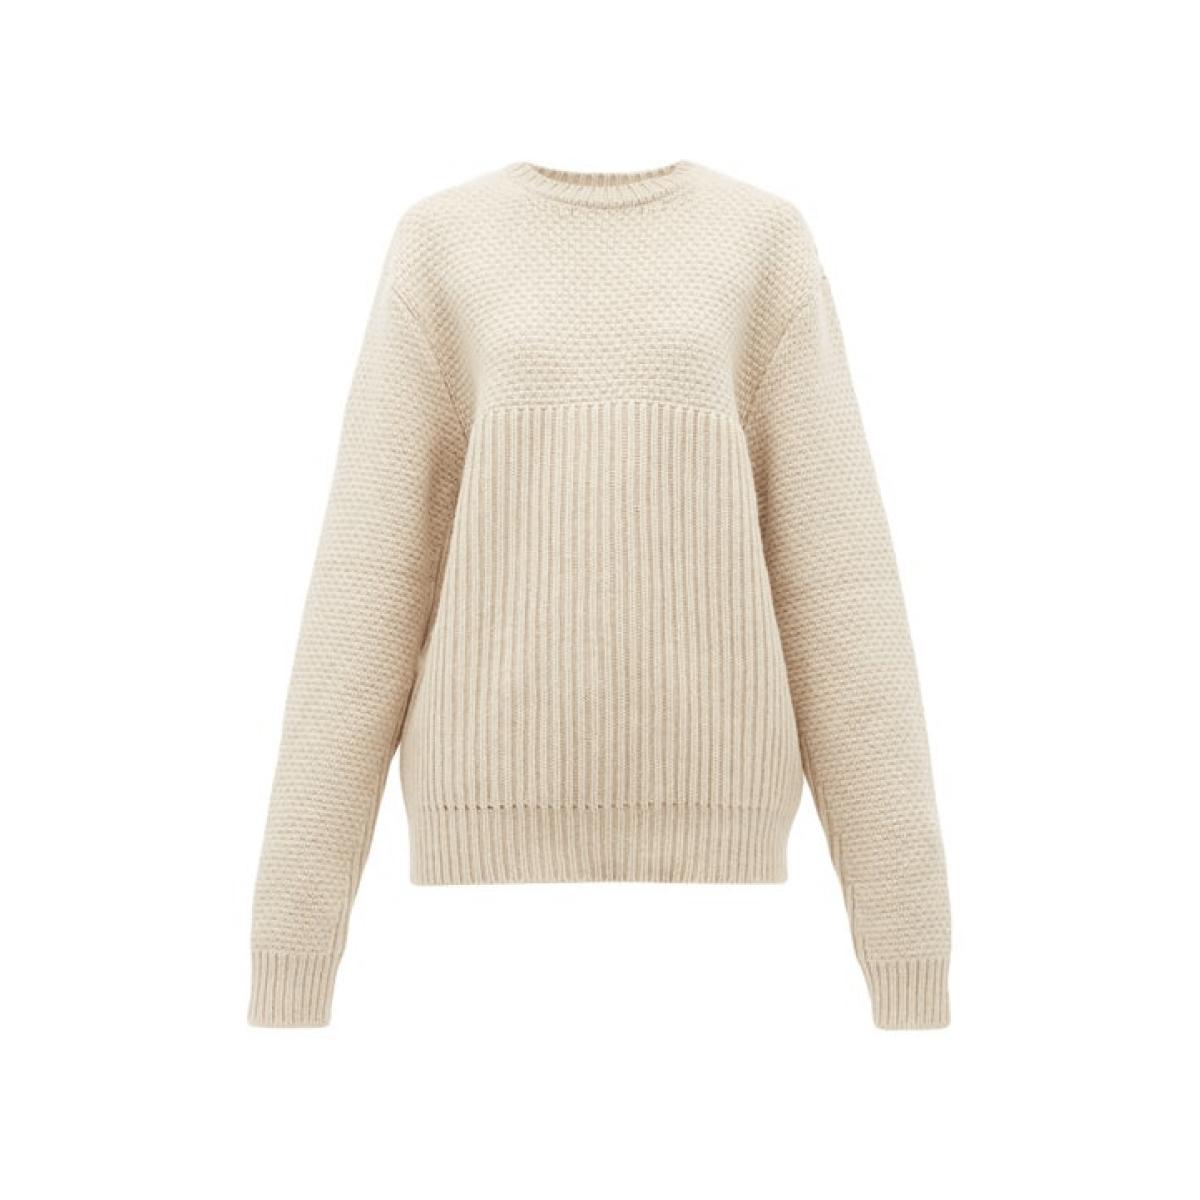 Raey sweater